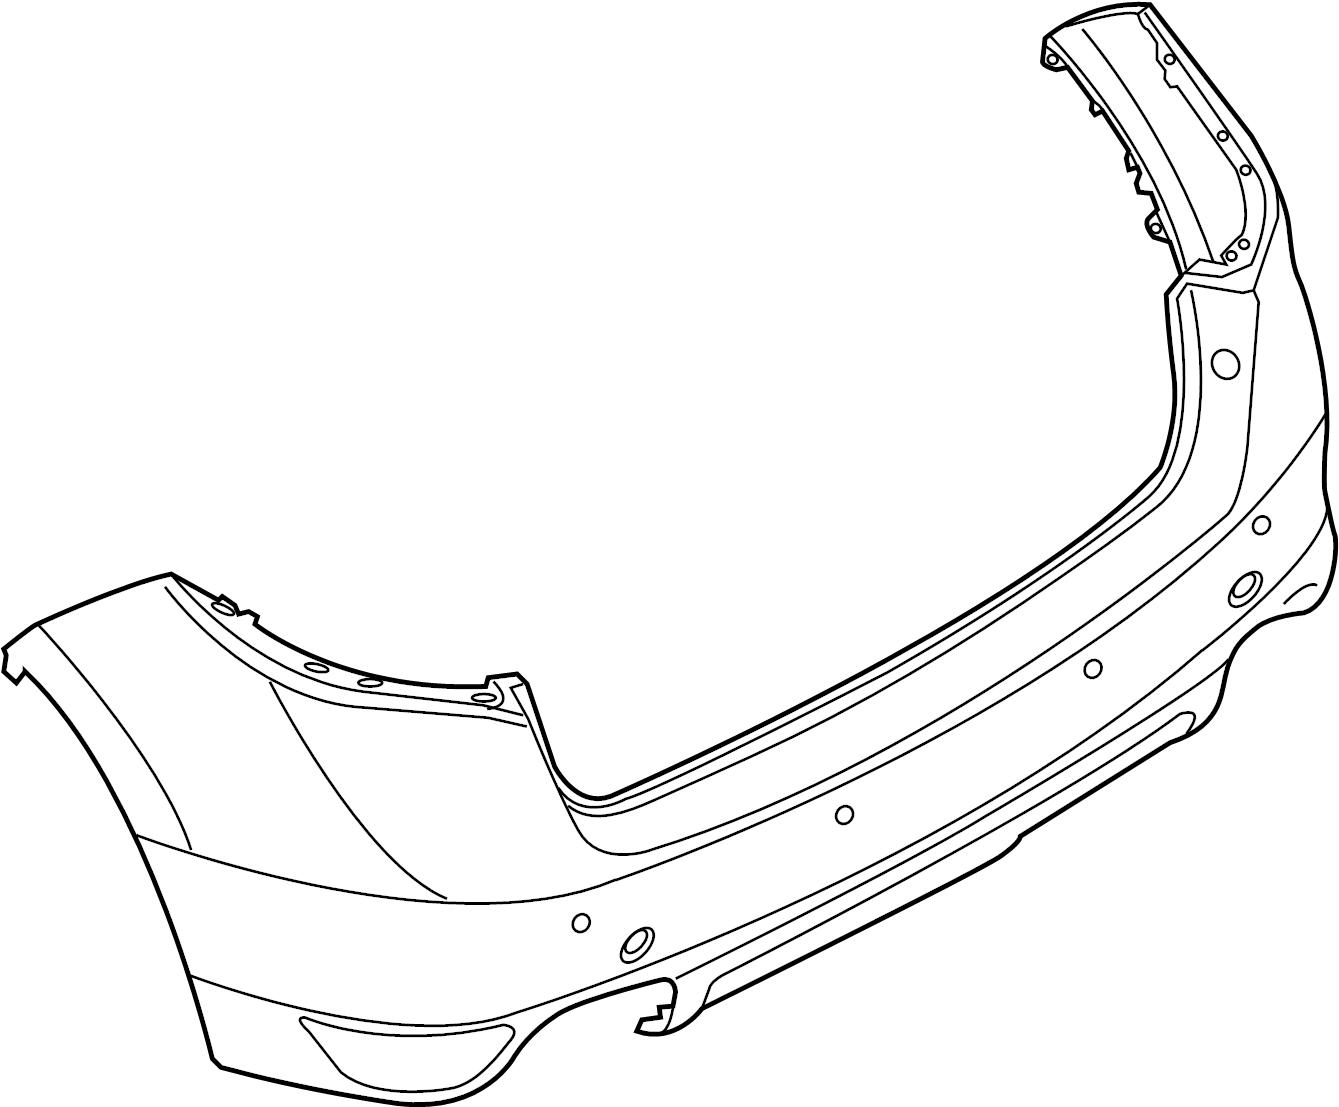 2013 Porsche Cayenne Bumper cover. LINING REAR PRIME CO